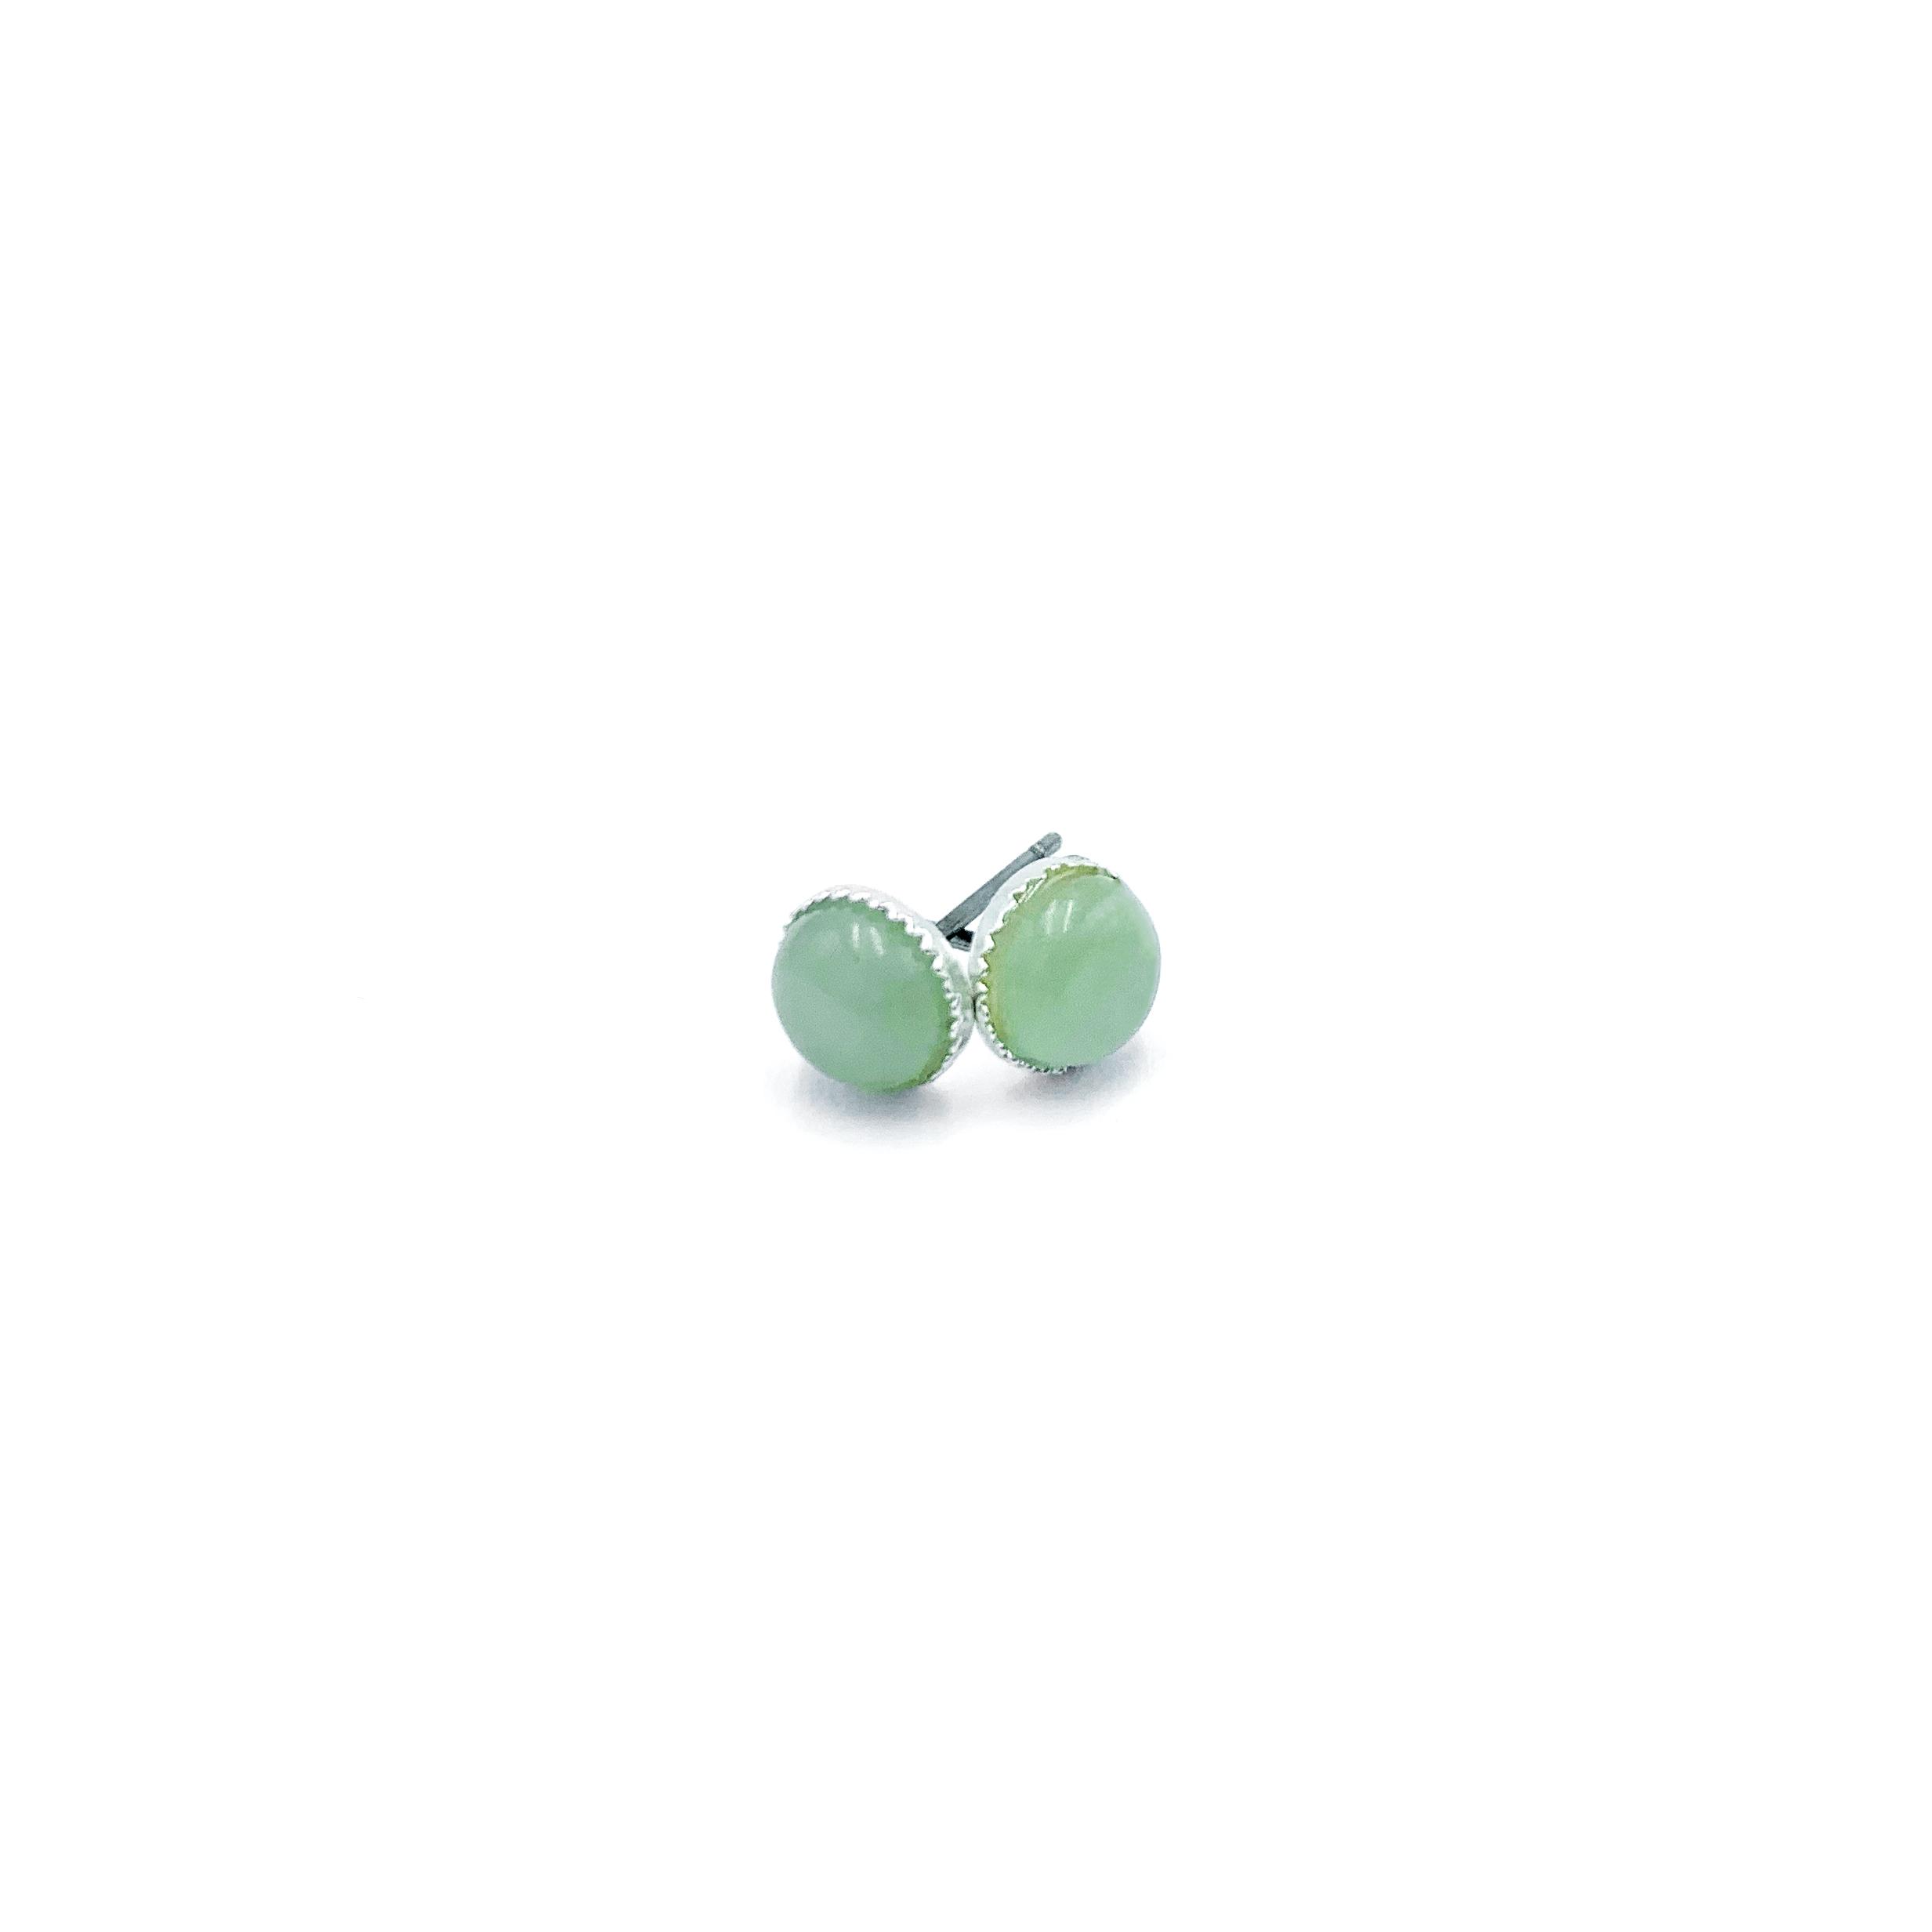 Boucles d'Oreilles - Aventurine Verte Image